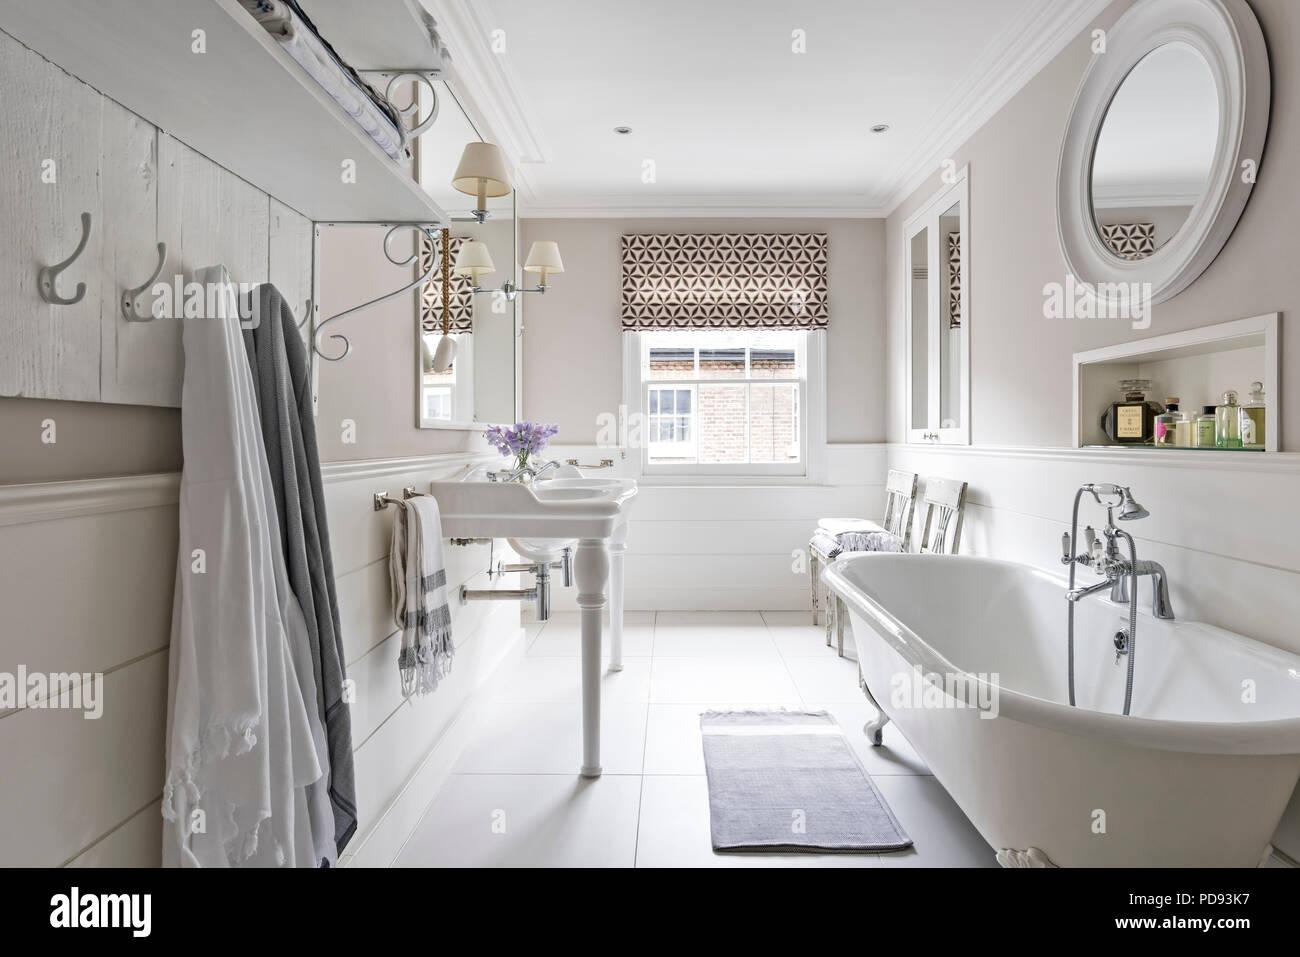 Vasca Da Bagno In Francese : In stile francese di bacini e un free standing vasca nel bagno